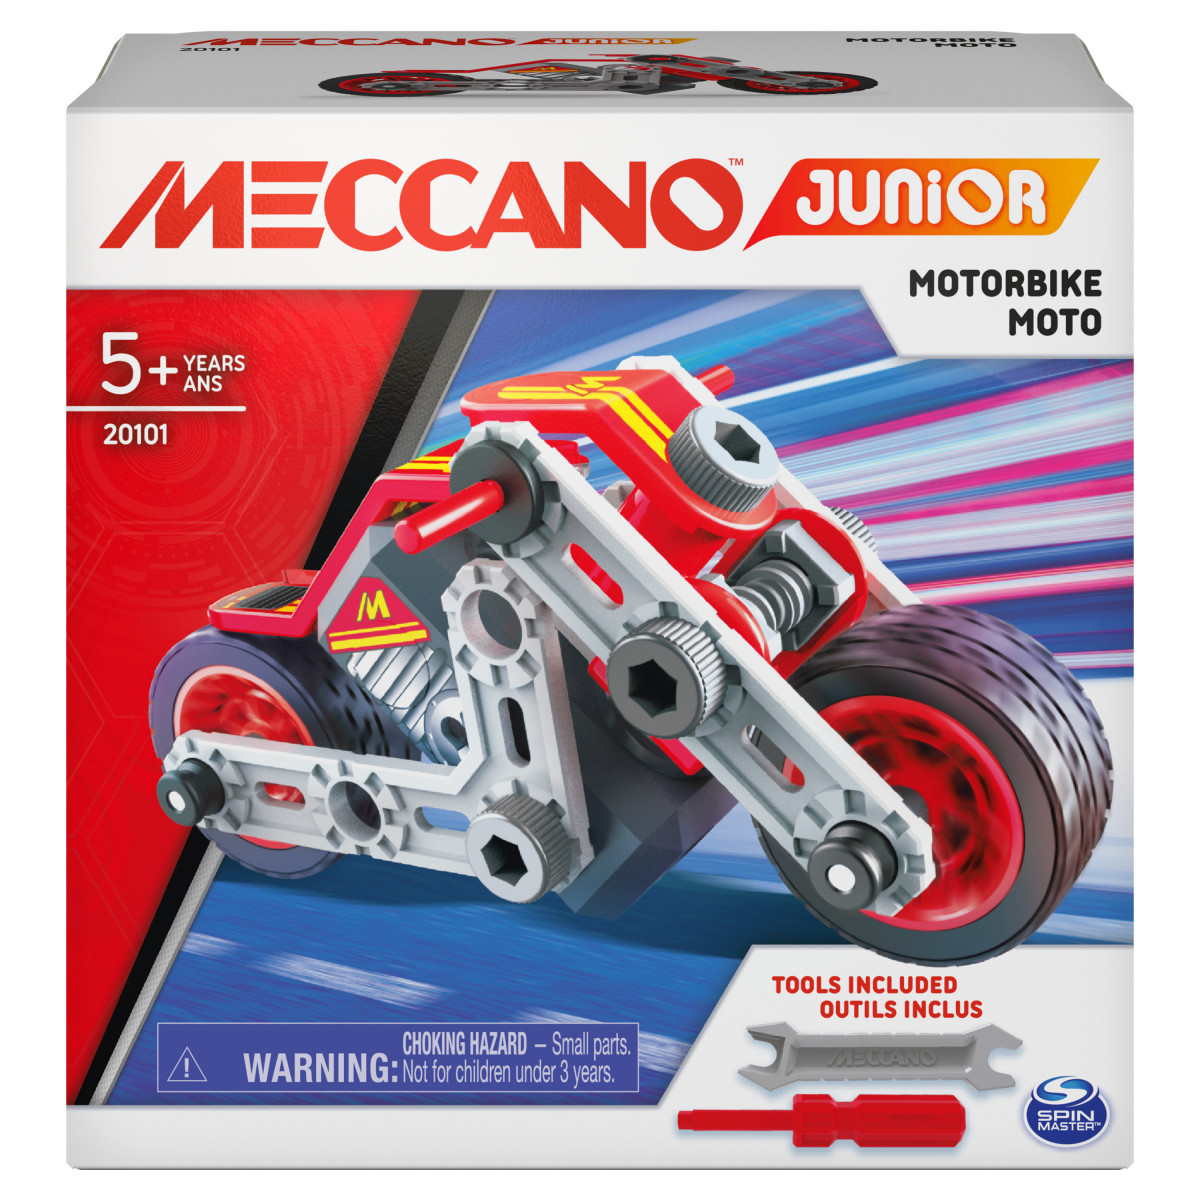 6055090 MES PREMIERES CONSTRUCTIONS MECCANO JUNIOR MOTO COFFRET